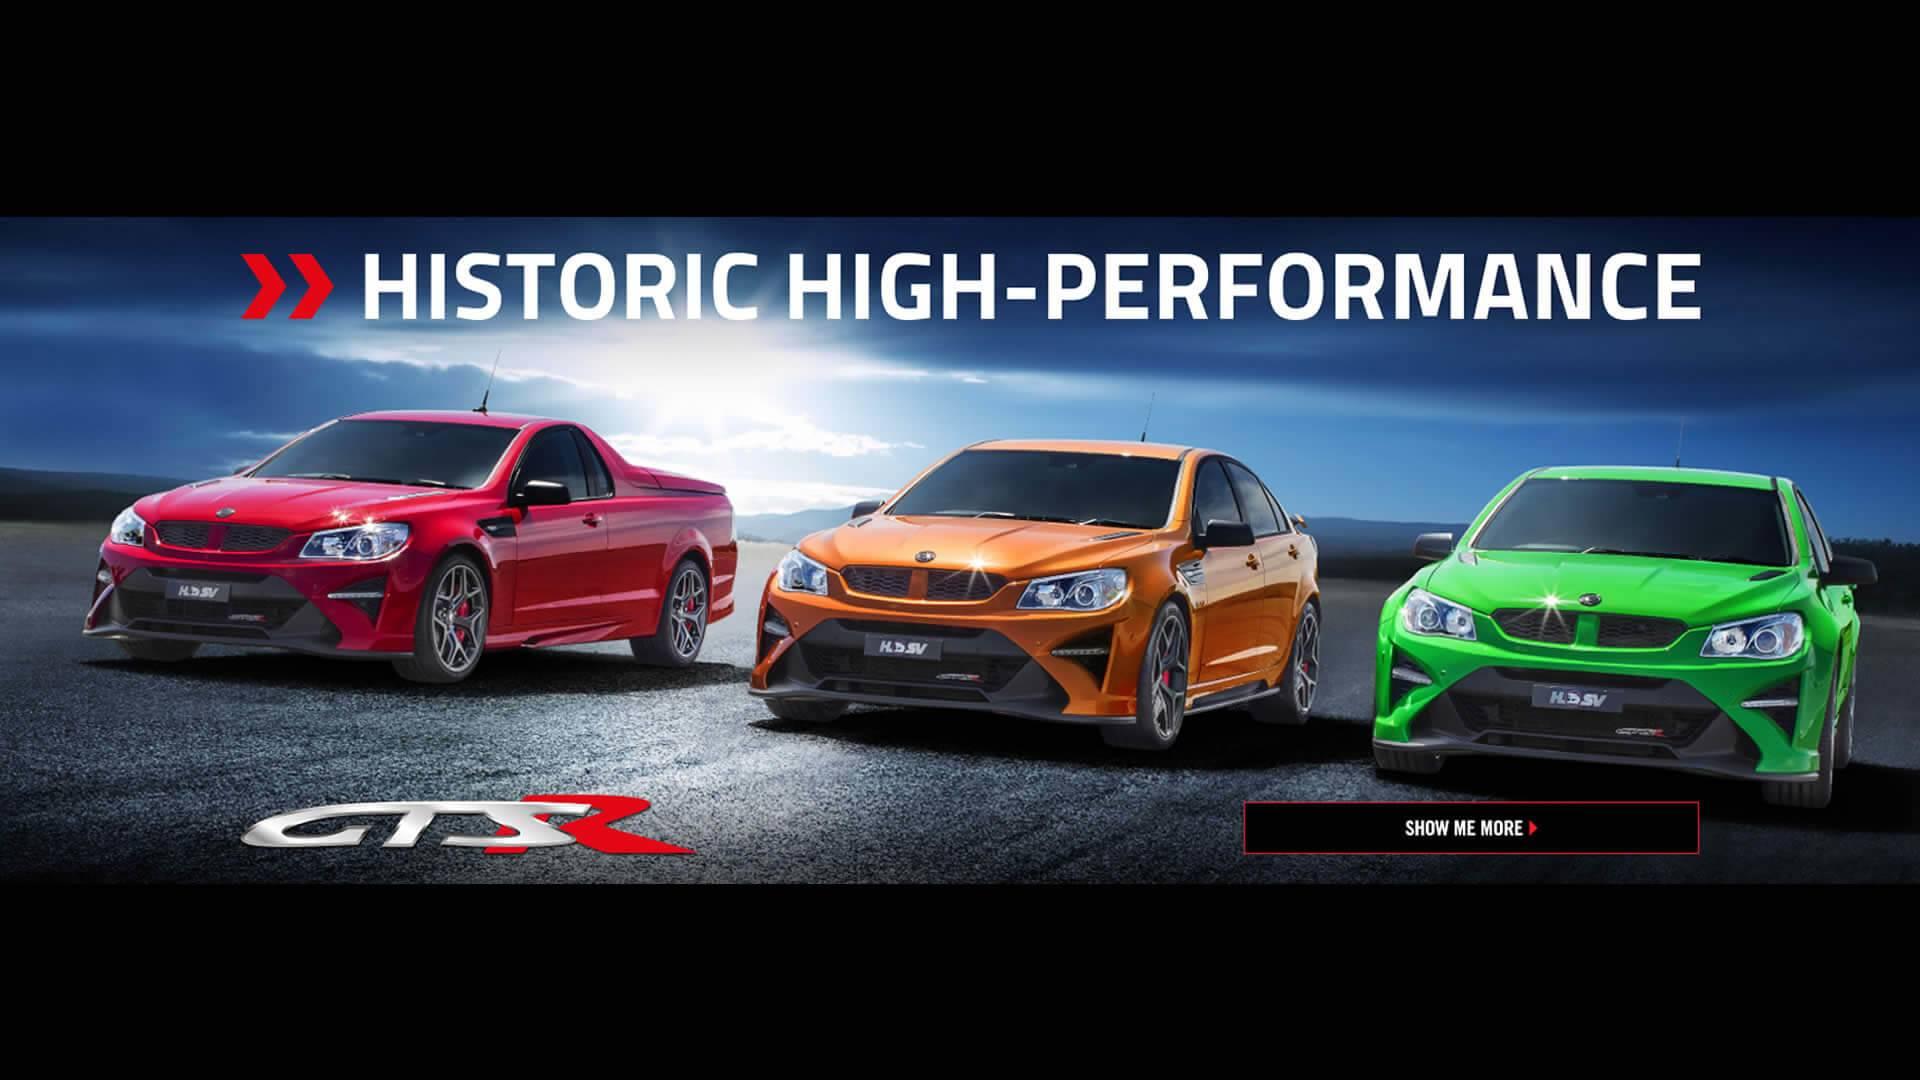 HSV TEMPLATE HISTORIC HIGH-PERFORMANCE